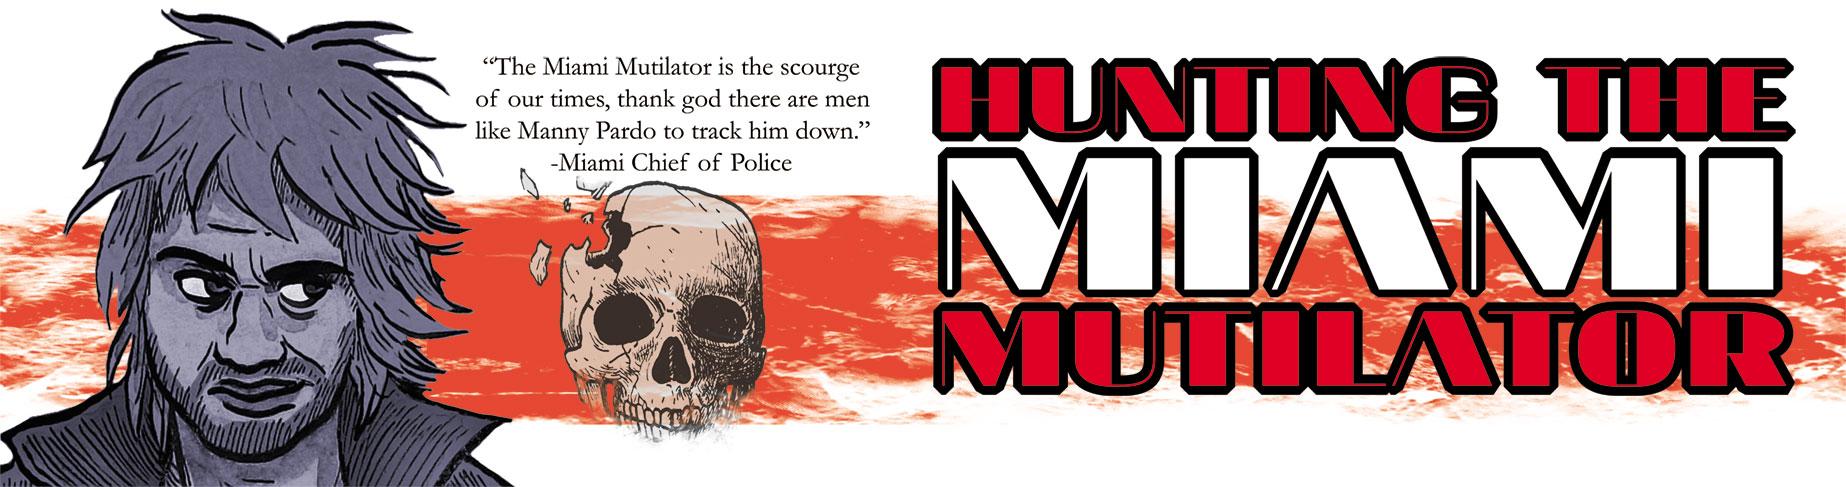 Hunting the Miami Mutilator